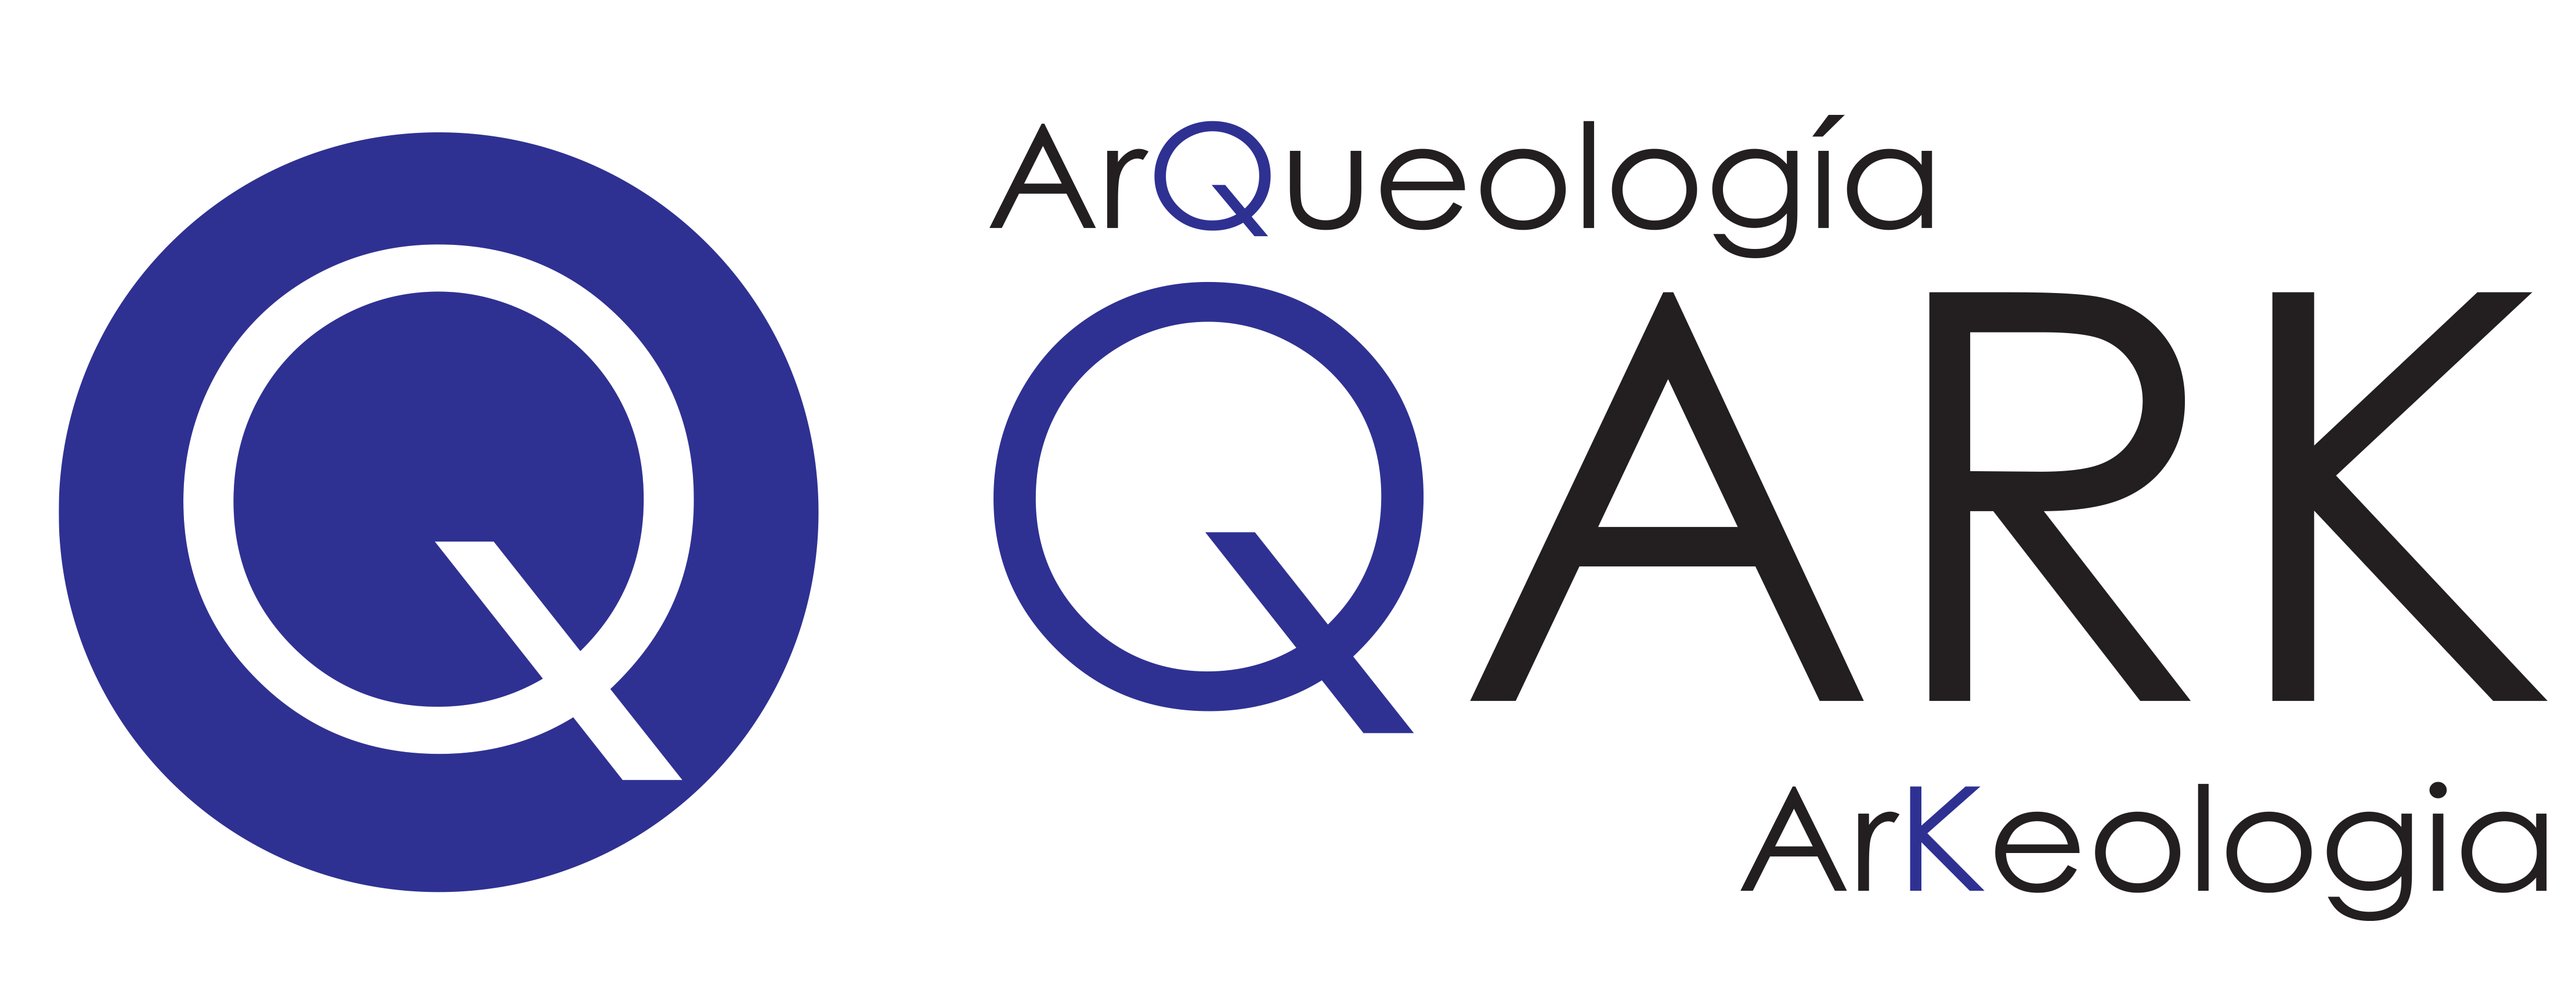 Qark Arqueología